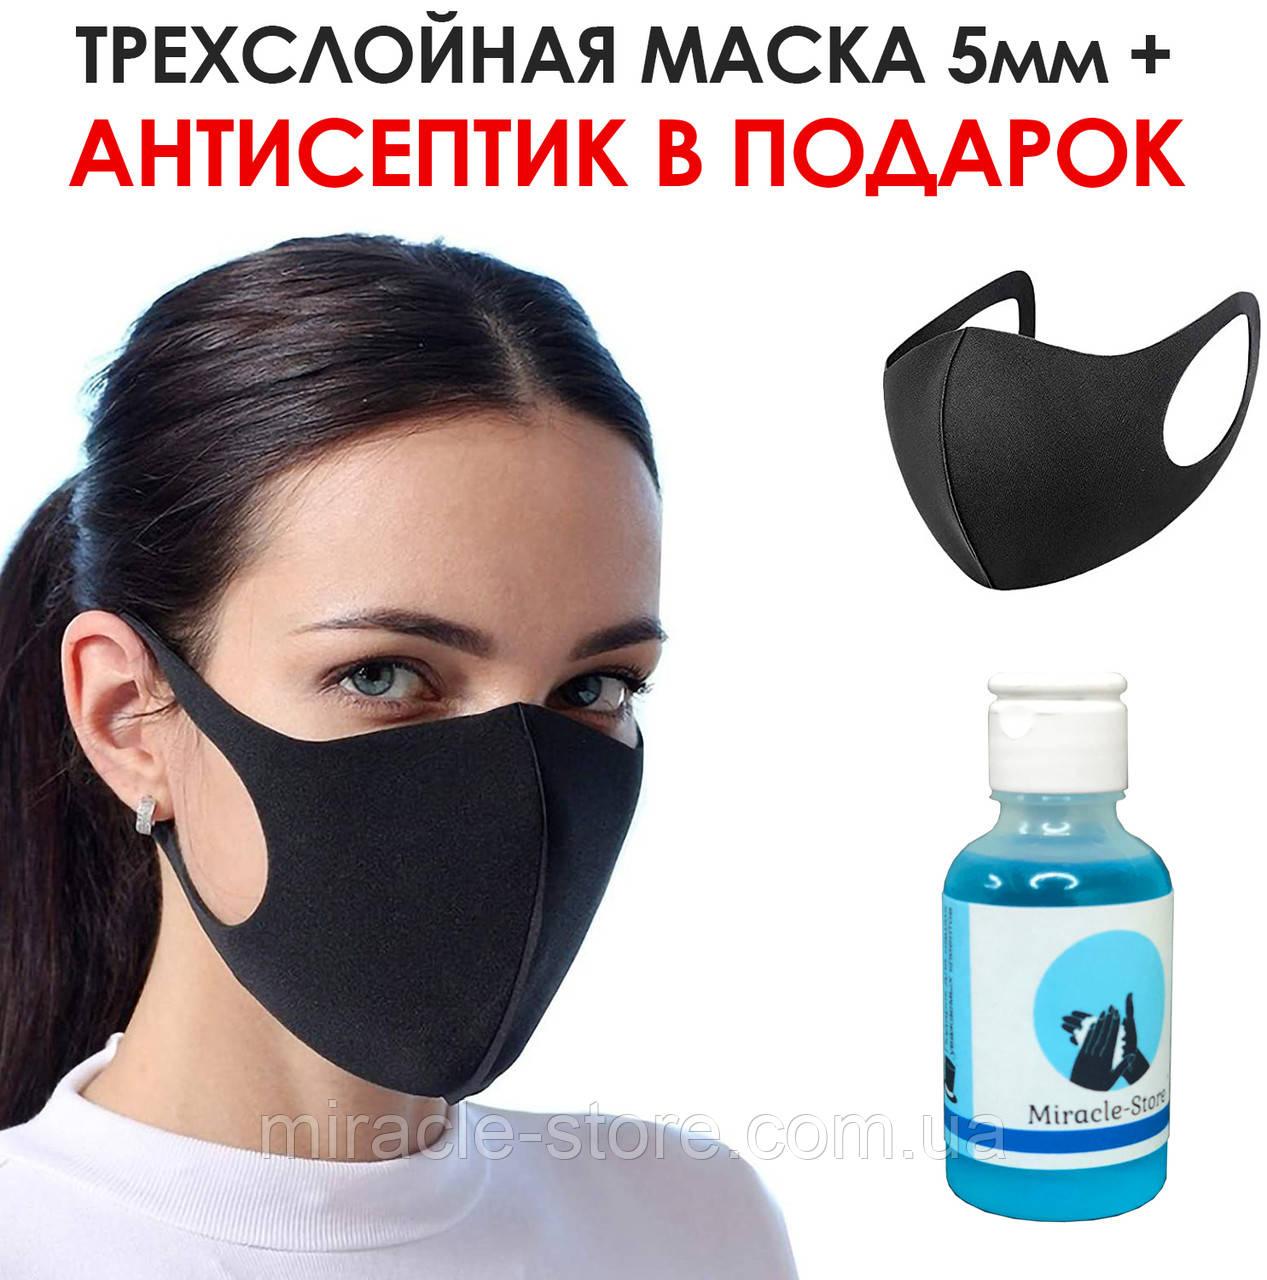 ТРИШАРОВА захисна маска 5мм, чорна Замшева антибактеріальна маска + ПОДАРУНОК Антисептик